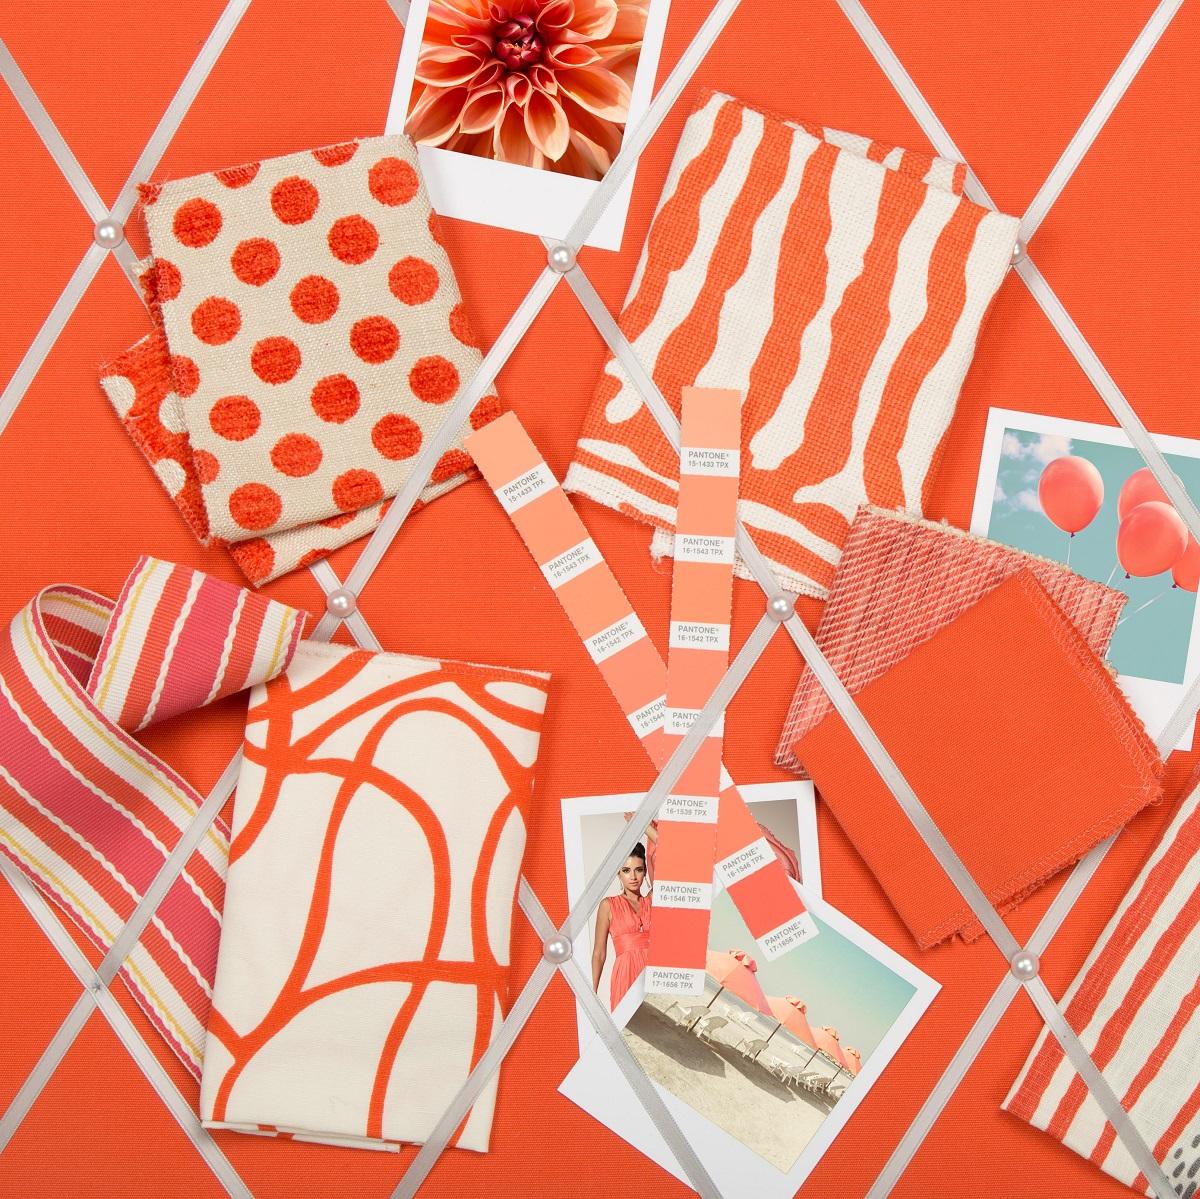 Kravet fabrics, trims and more in Pantone's Living Coral. Photo: Kravet.